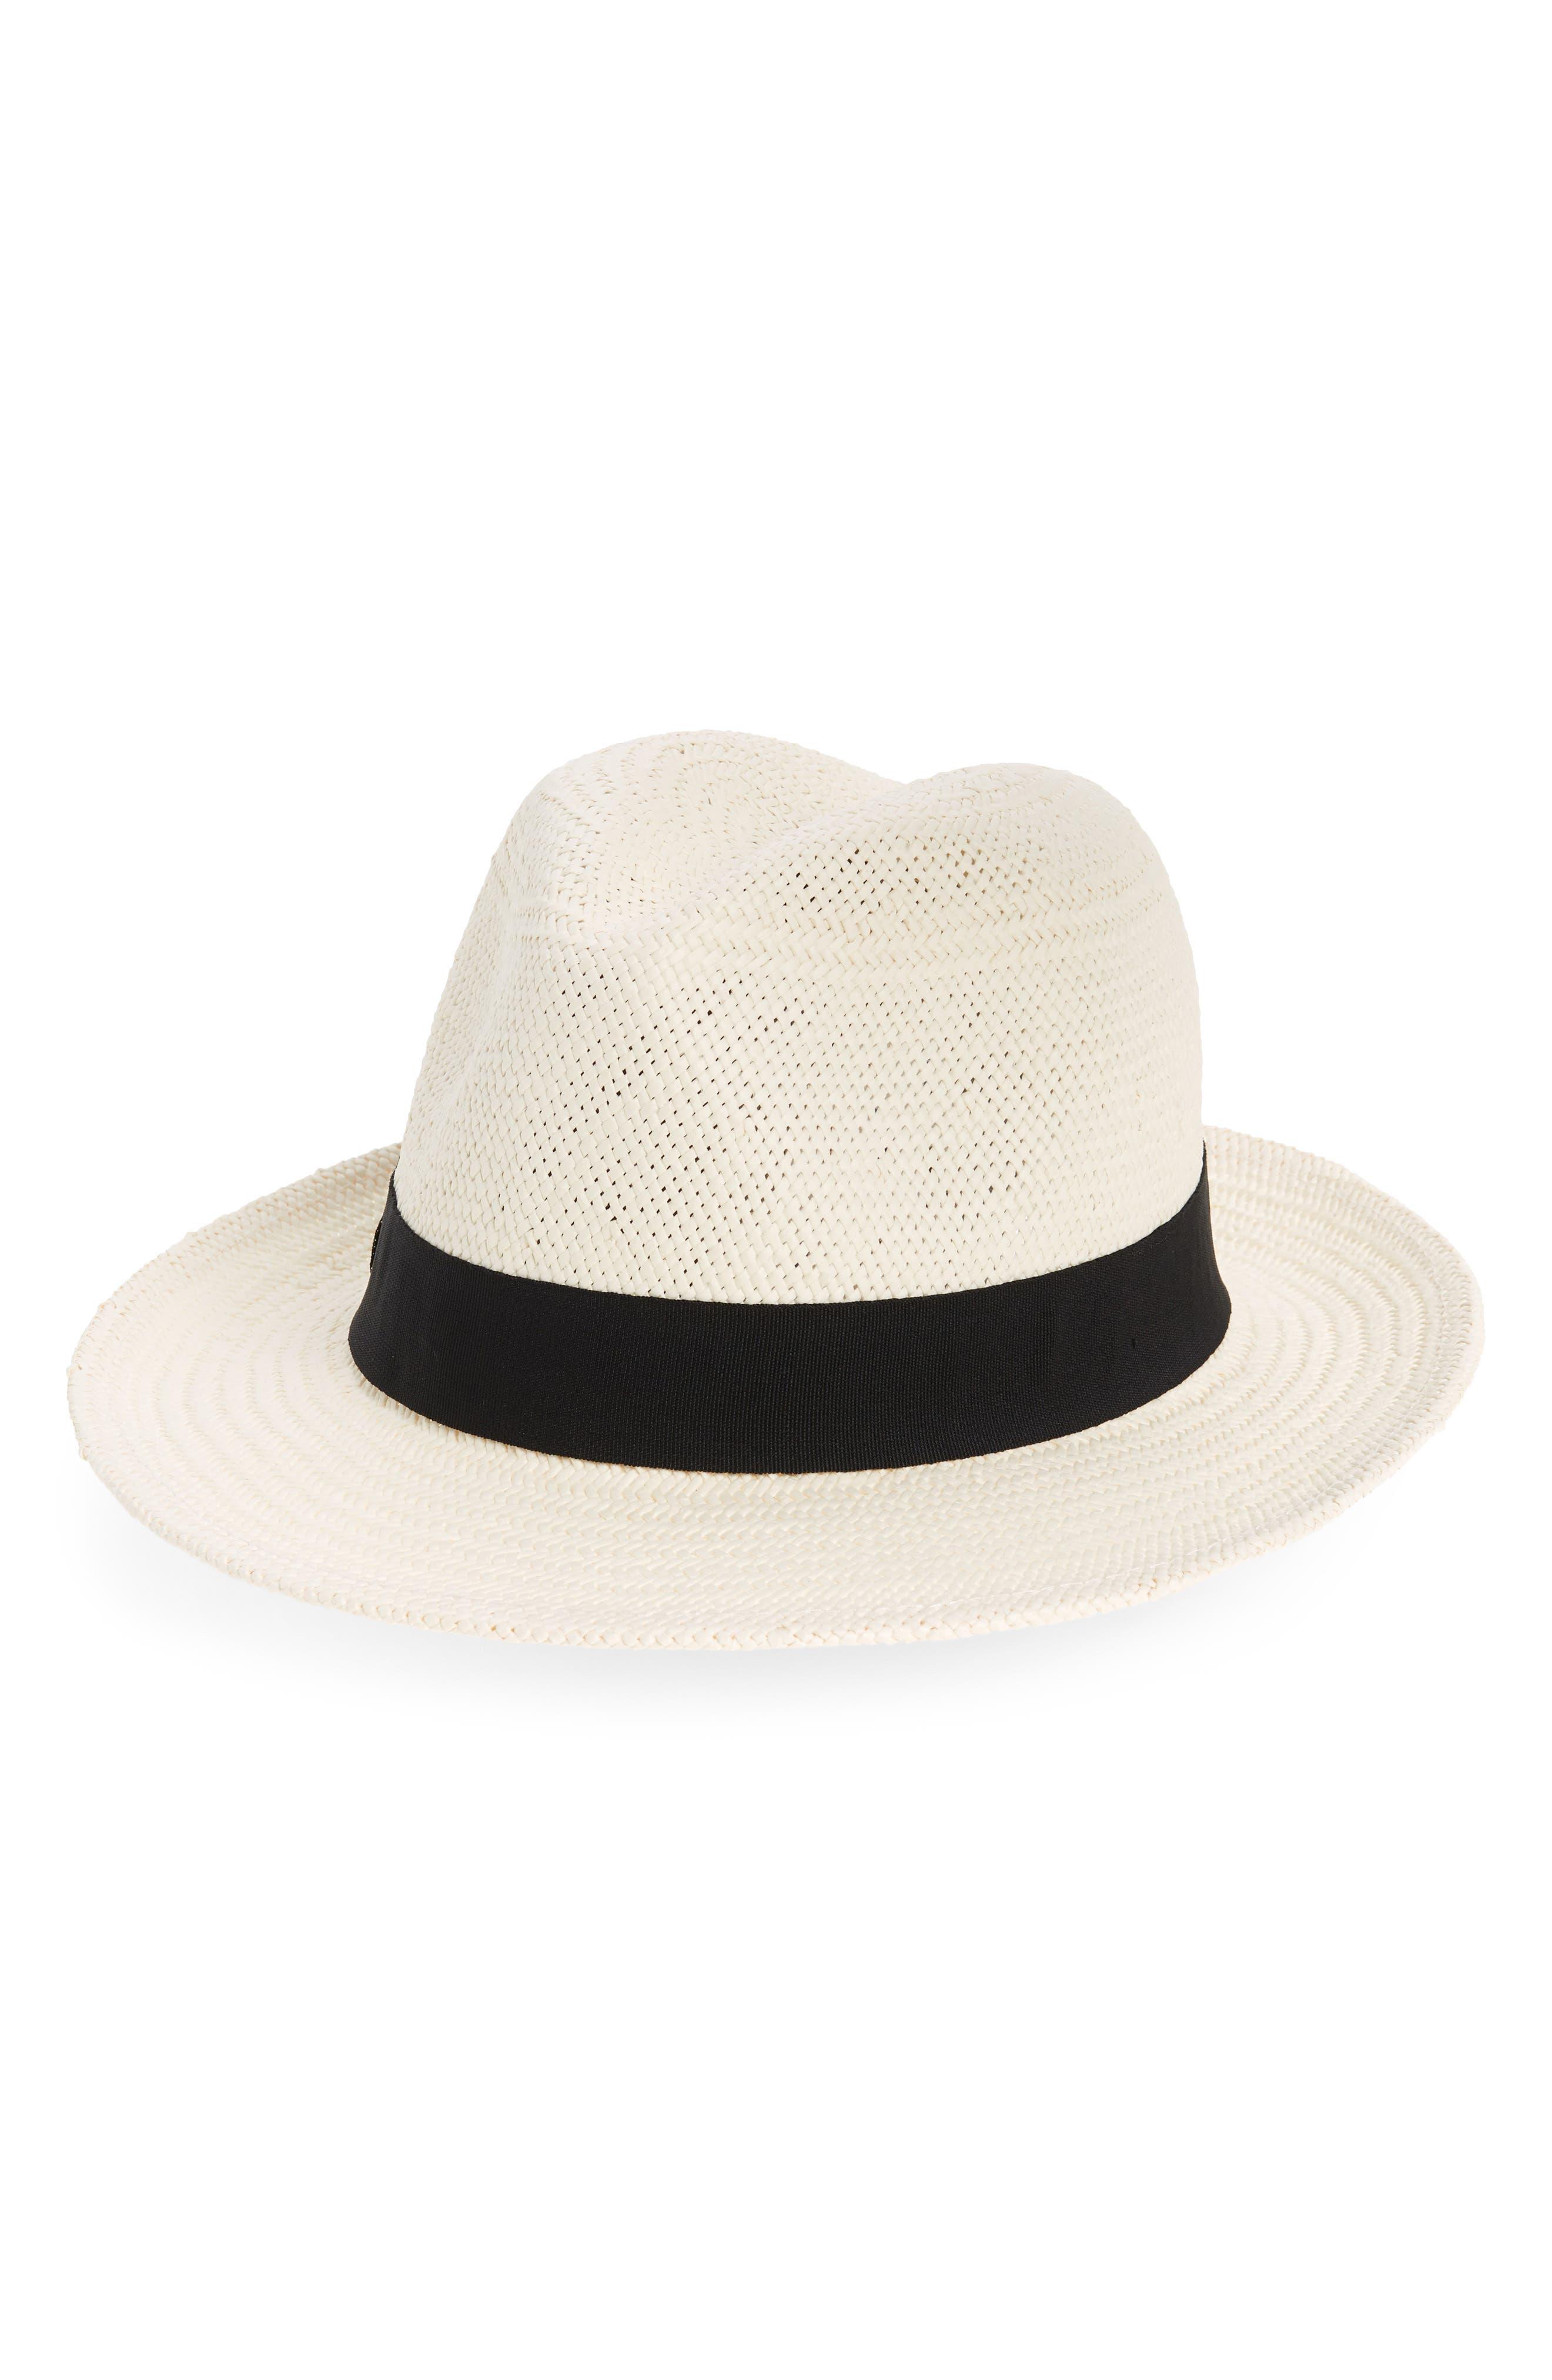 Straw Panama Hat,                         Main,                         color, 900